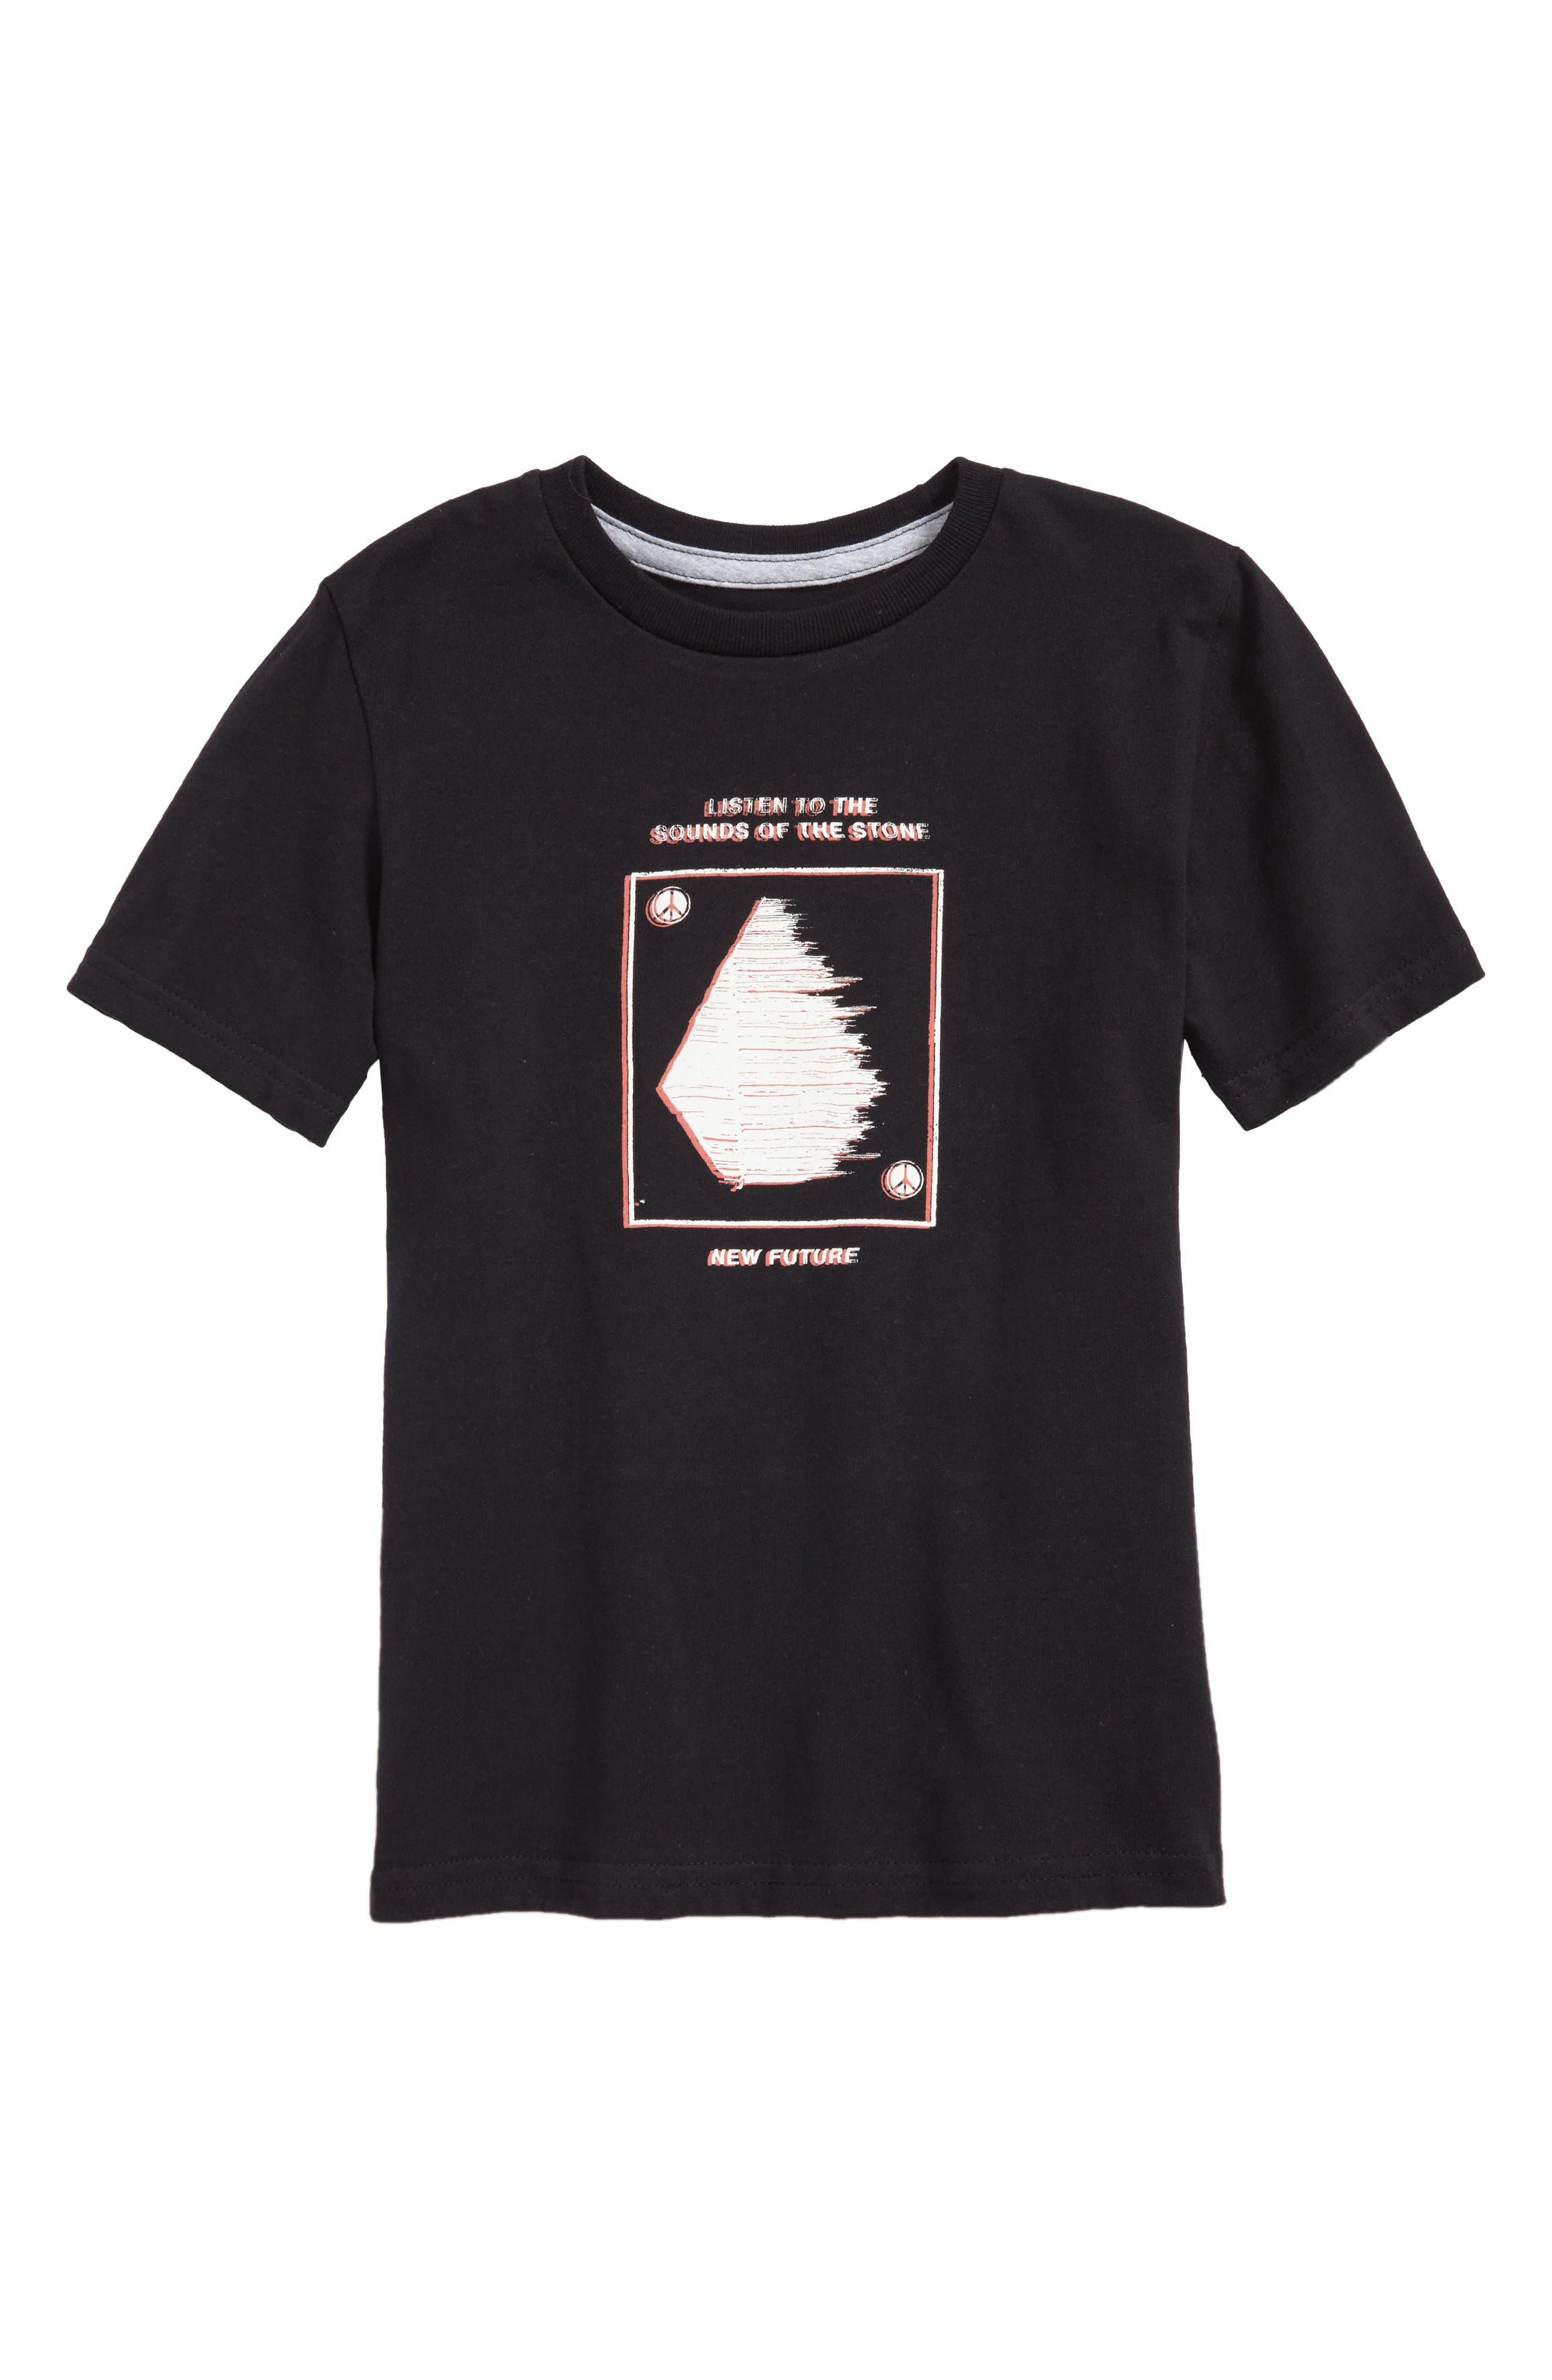 Sound T-Shirt,                             Main thumbnail 1, color,                             Black